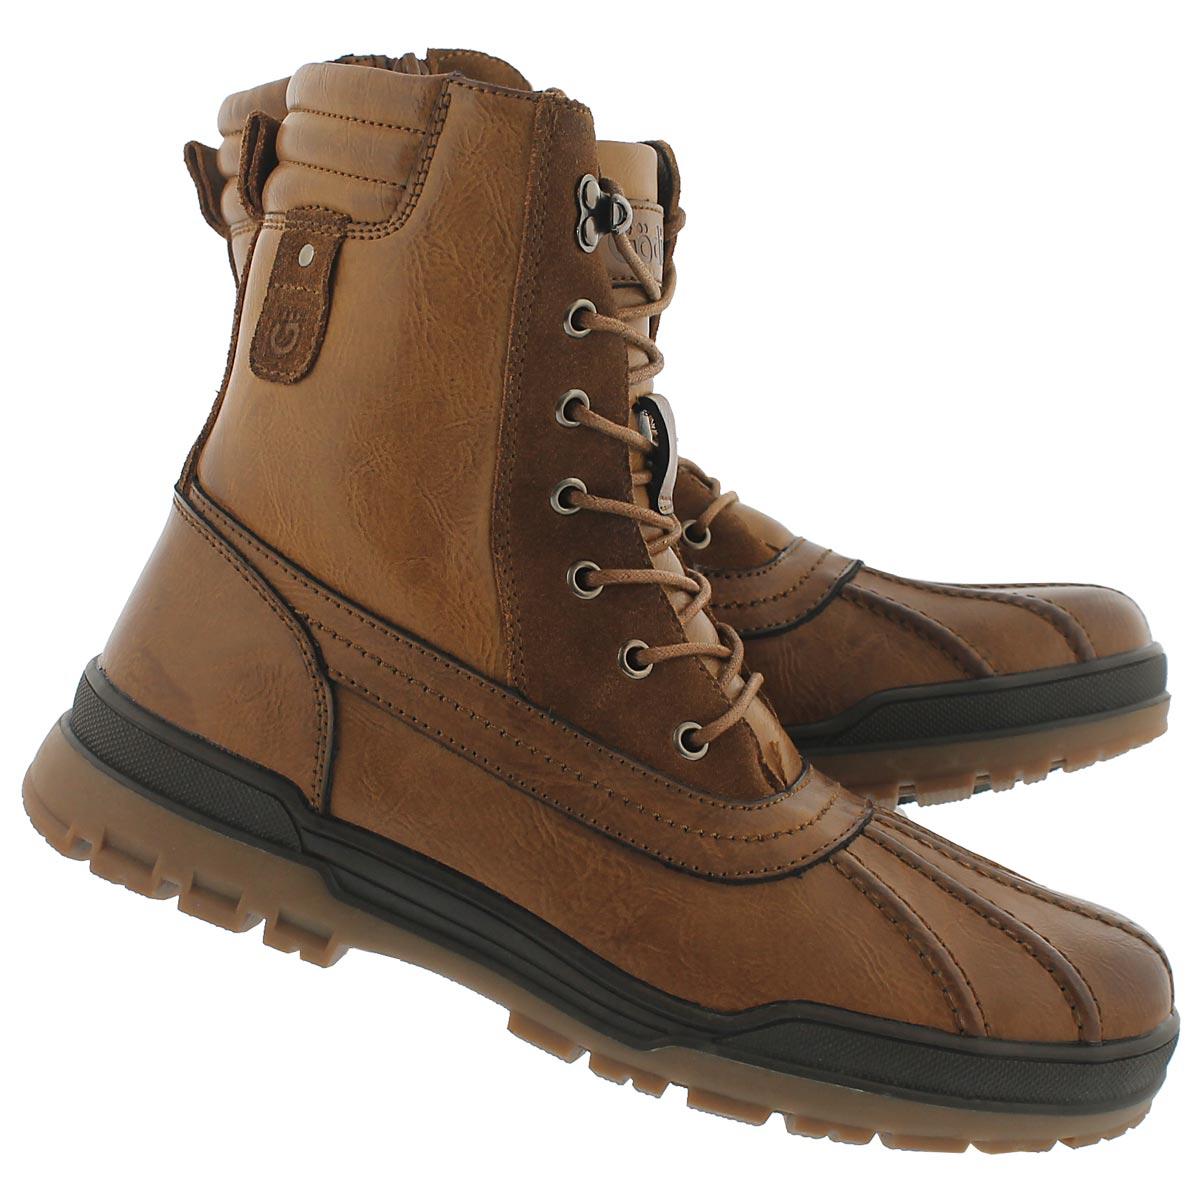 Mns York camel wtrpf winter boot